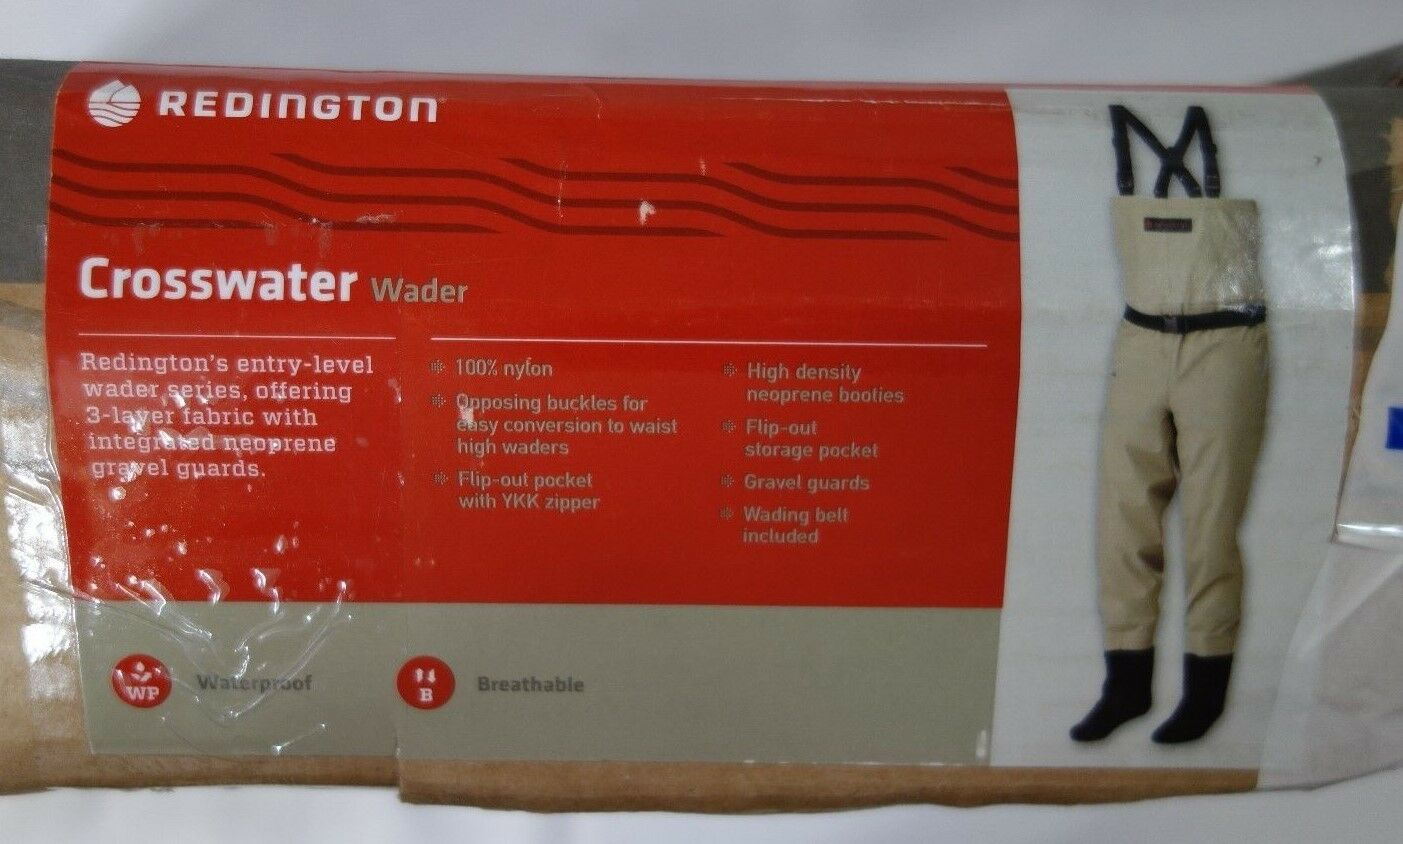 REDINGTON CROSSWATER WADER LARGE fishing waterproof breathable 3-layer Large